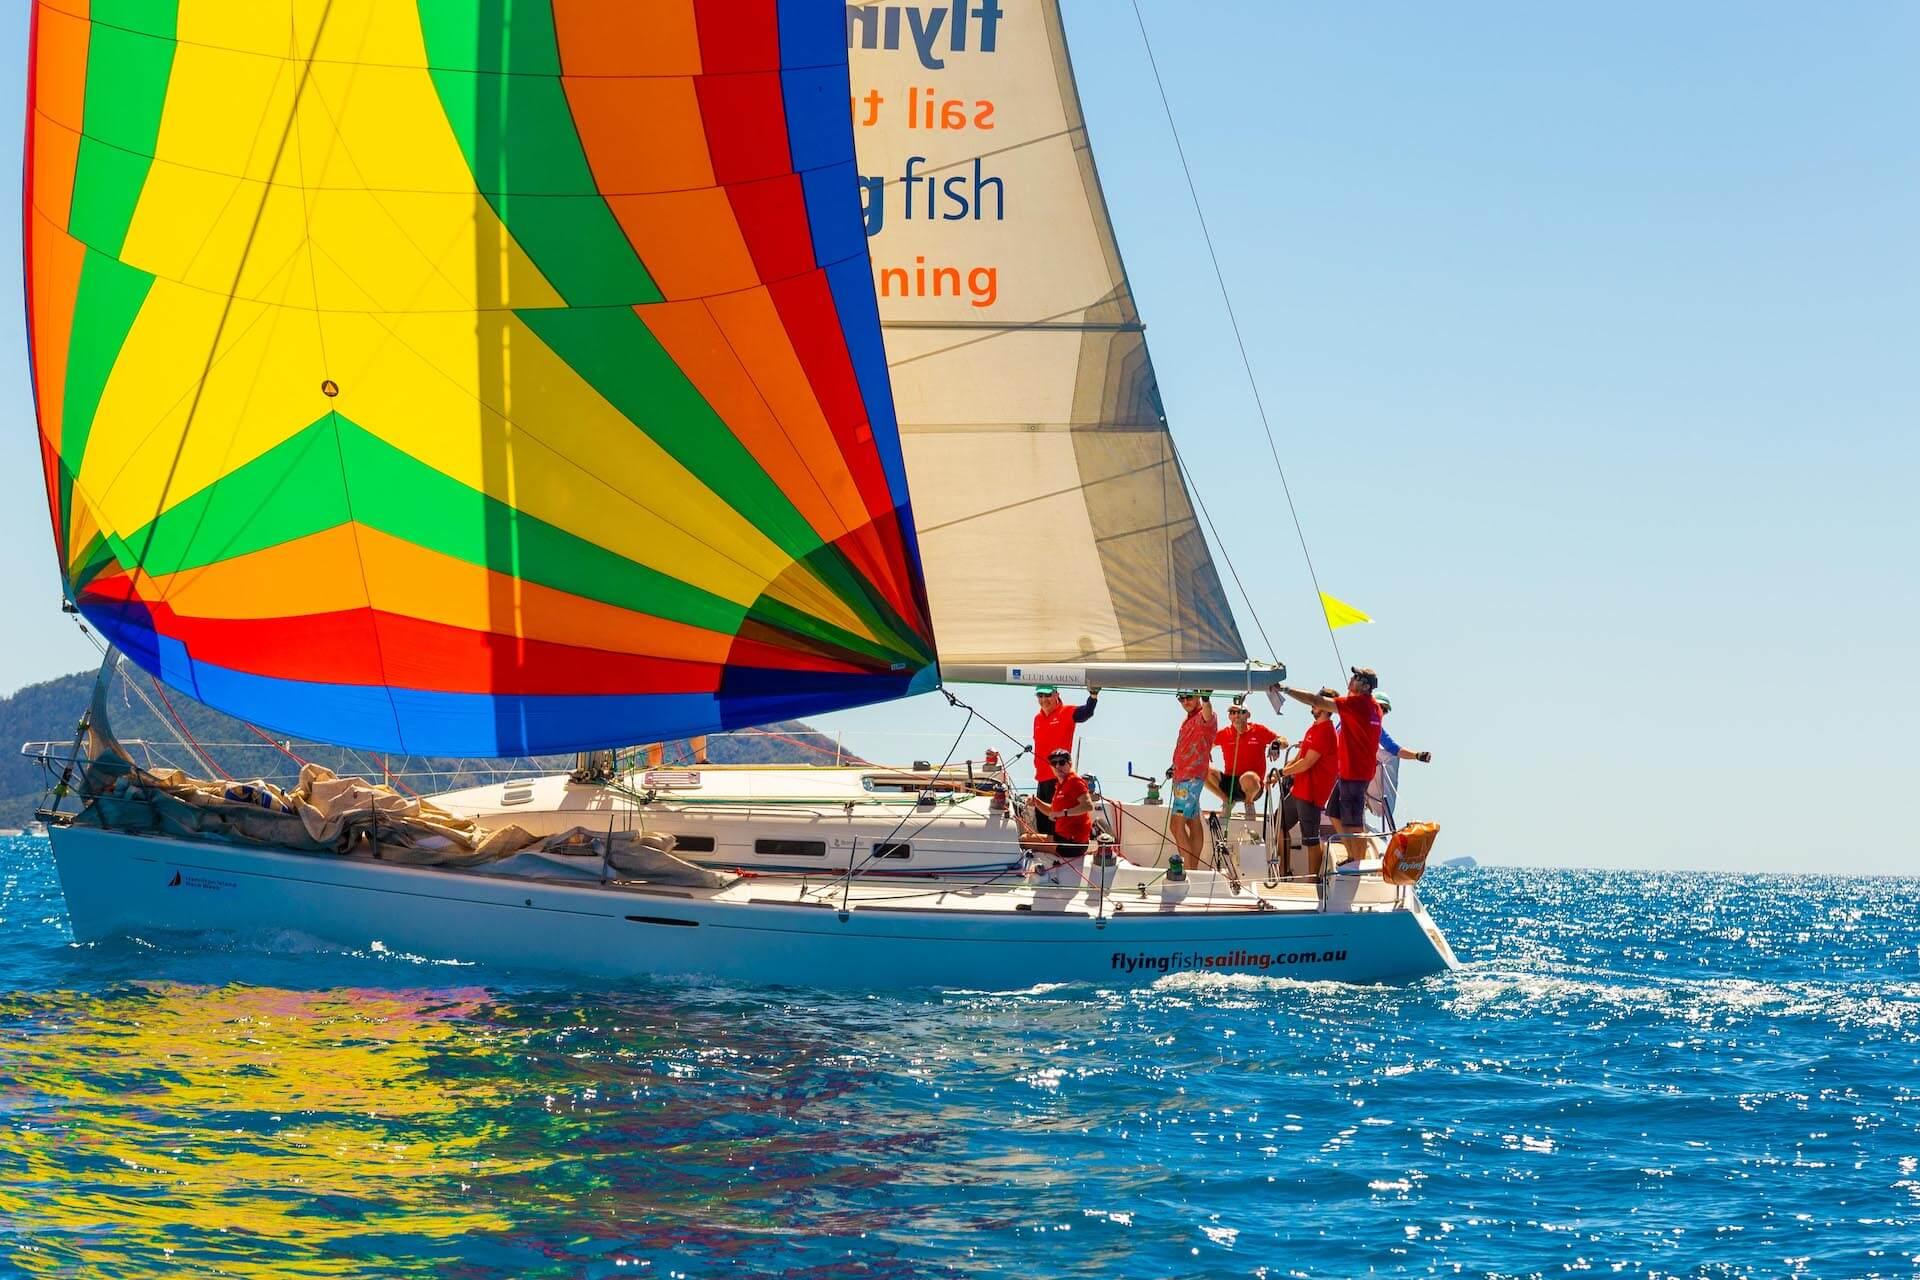 Flying-Fish-Sailing3